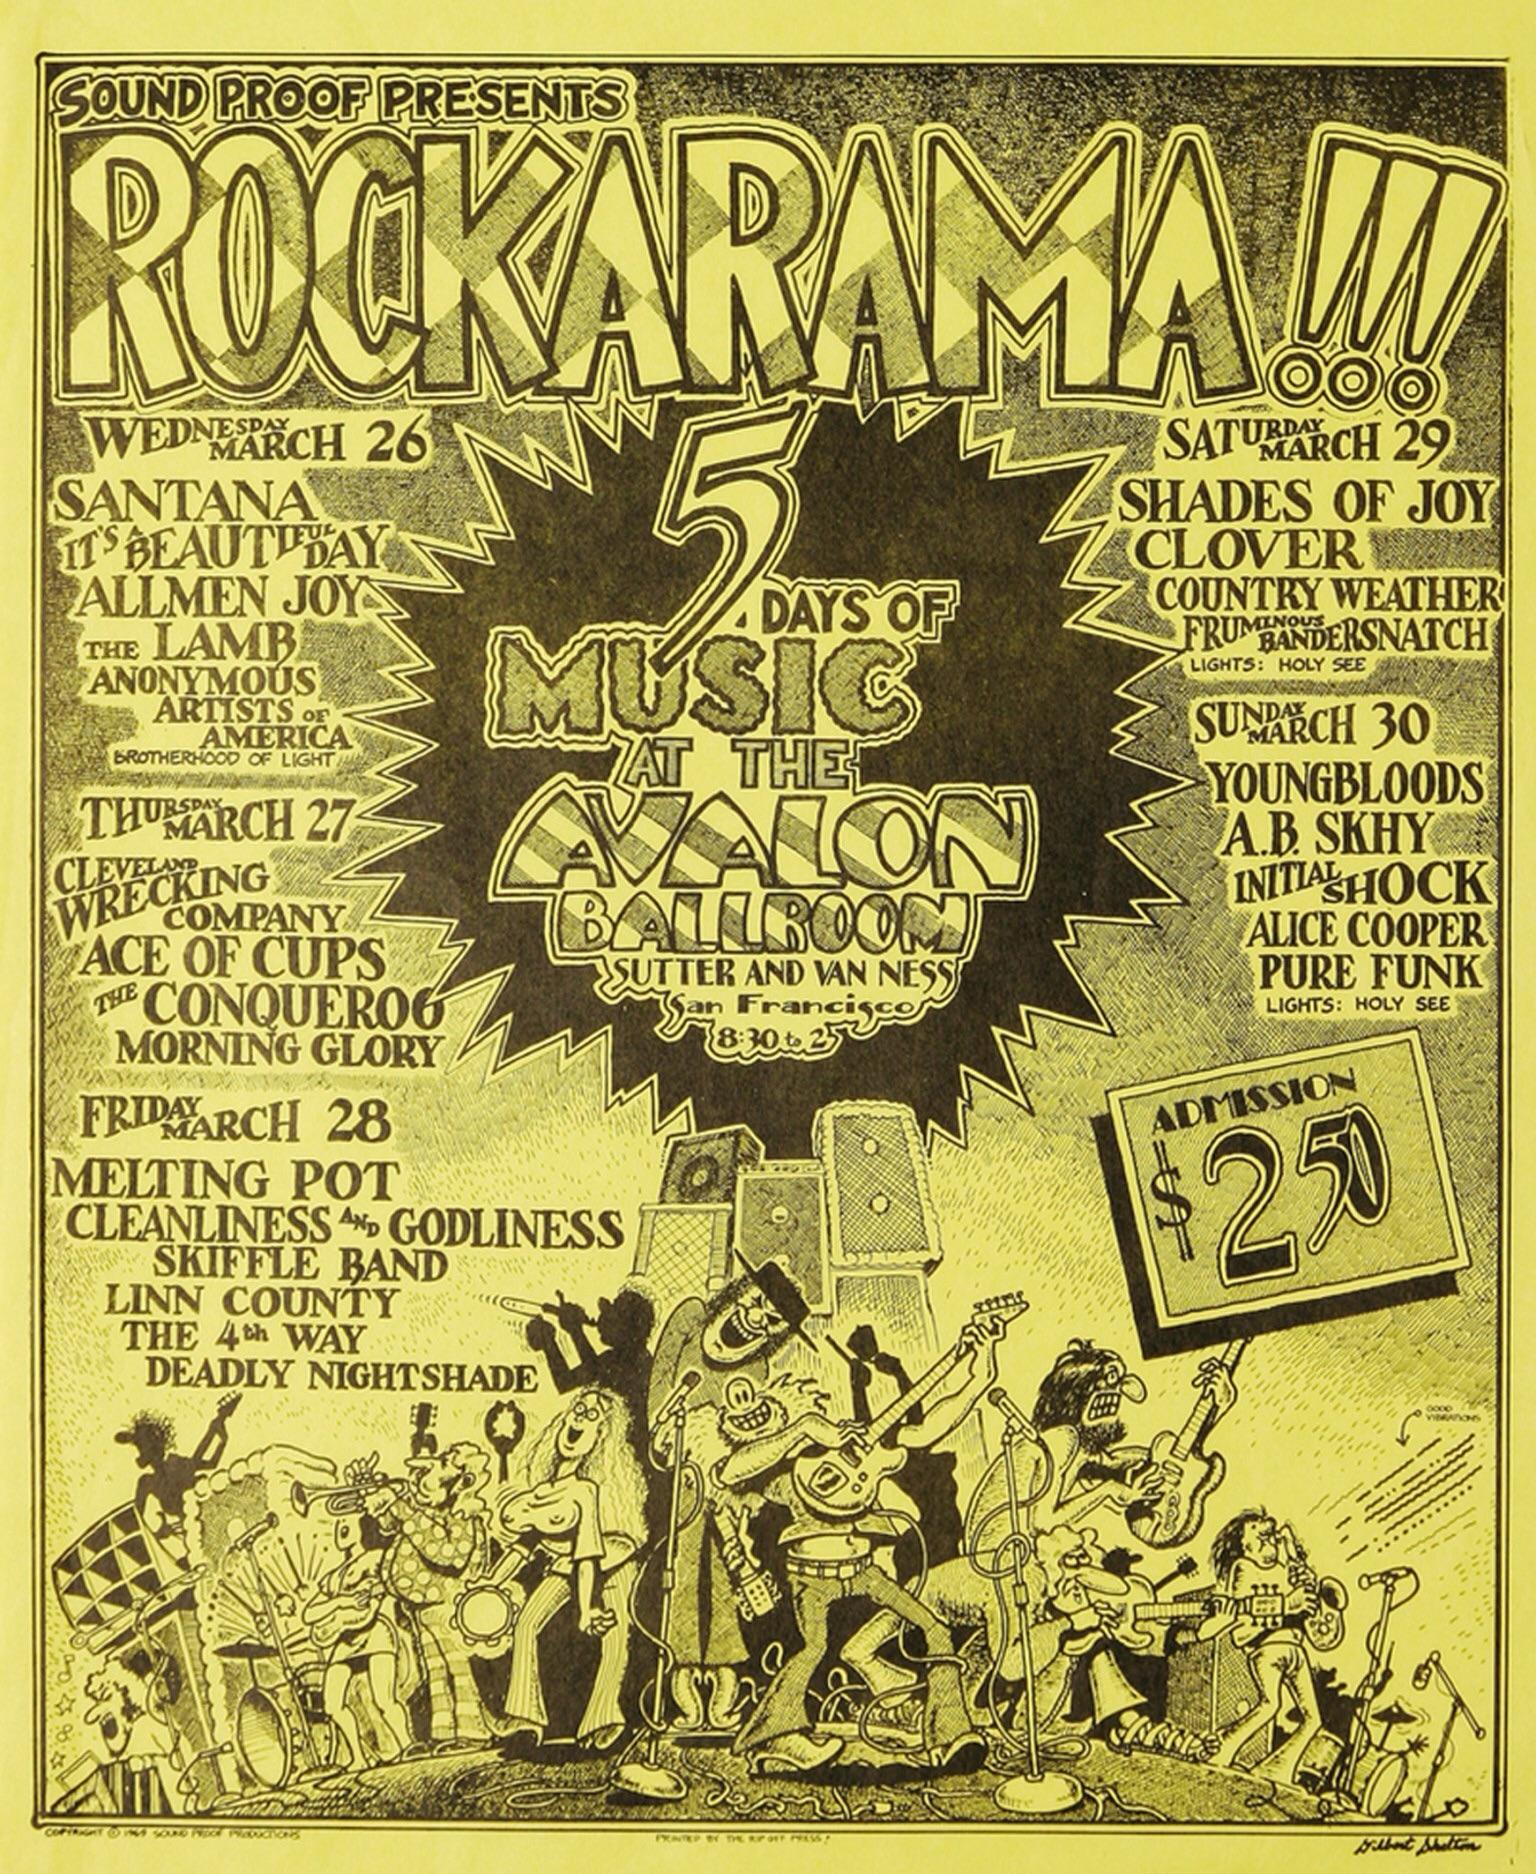 March 30, 1969 Avalon Ballroom, San Francisco, CA | Concerts